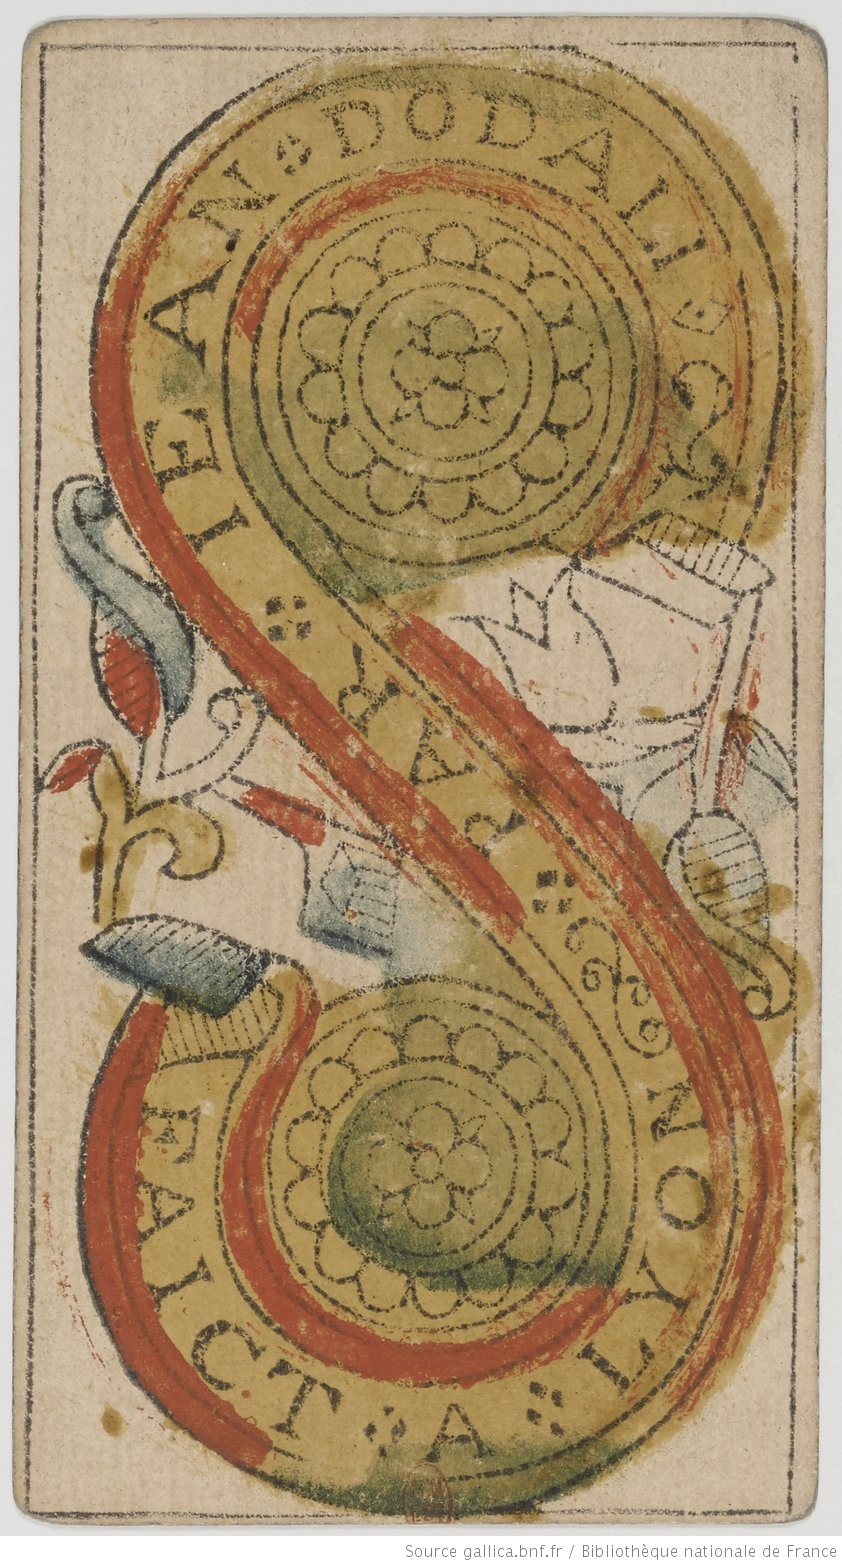 http://gallica.bnf.fr/ark:/12148/btv1b10537343h/f3.highres